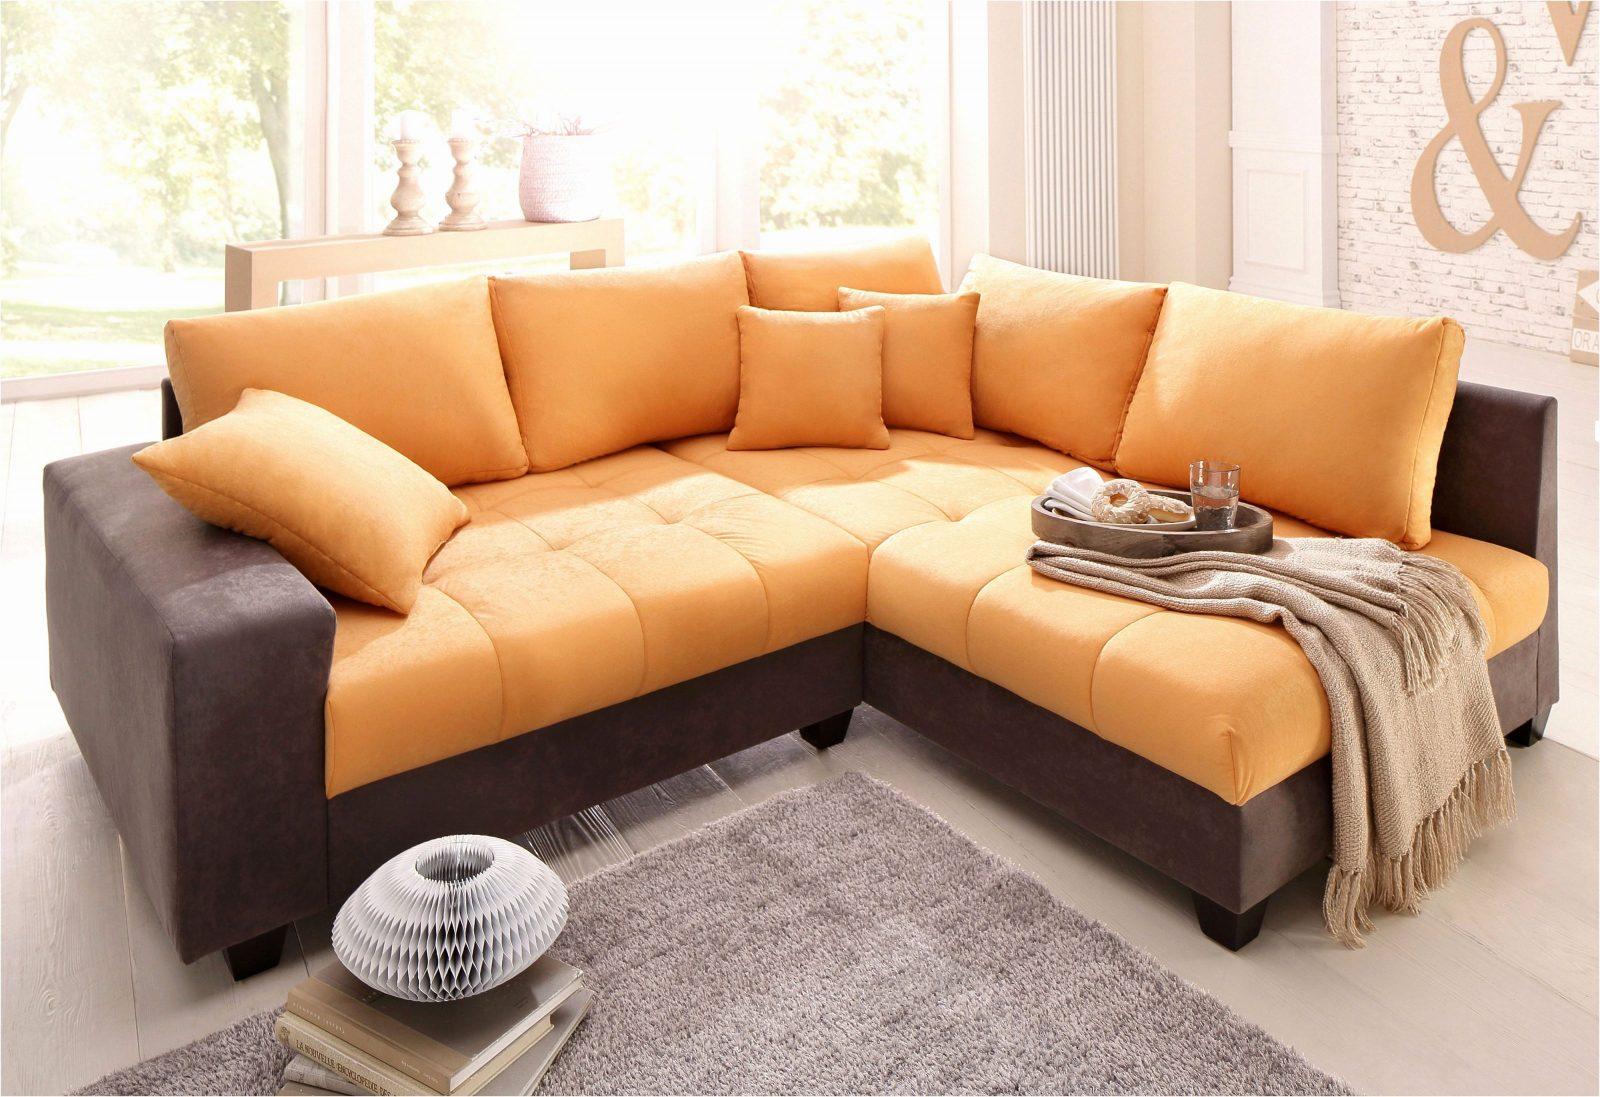 19 Sofa Auf Raten Kaufen Trotz Schufa Inspirierend  Lqaff von Sofa Auf Raten Kaufen Trotz Schufa Bild